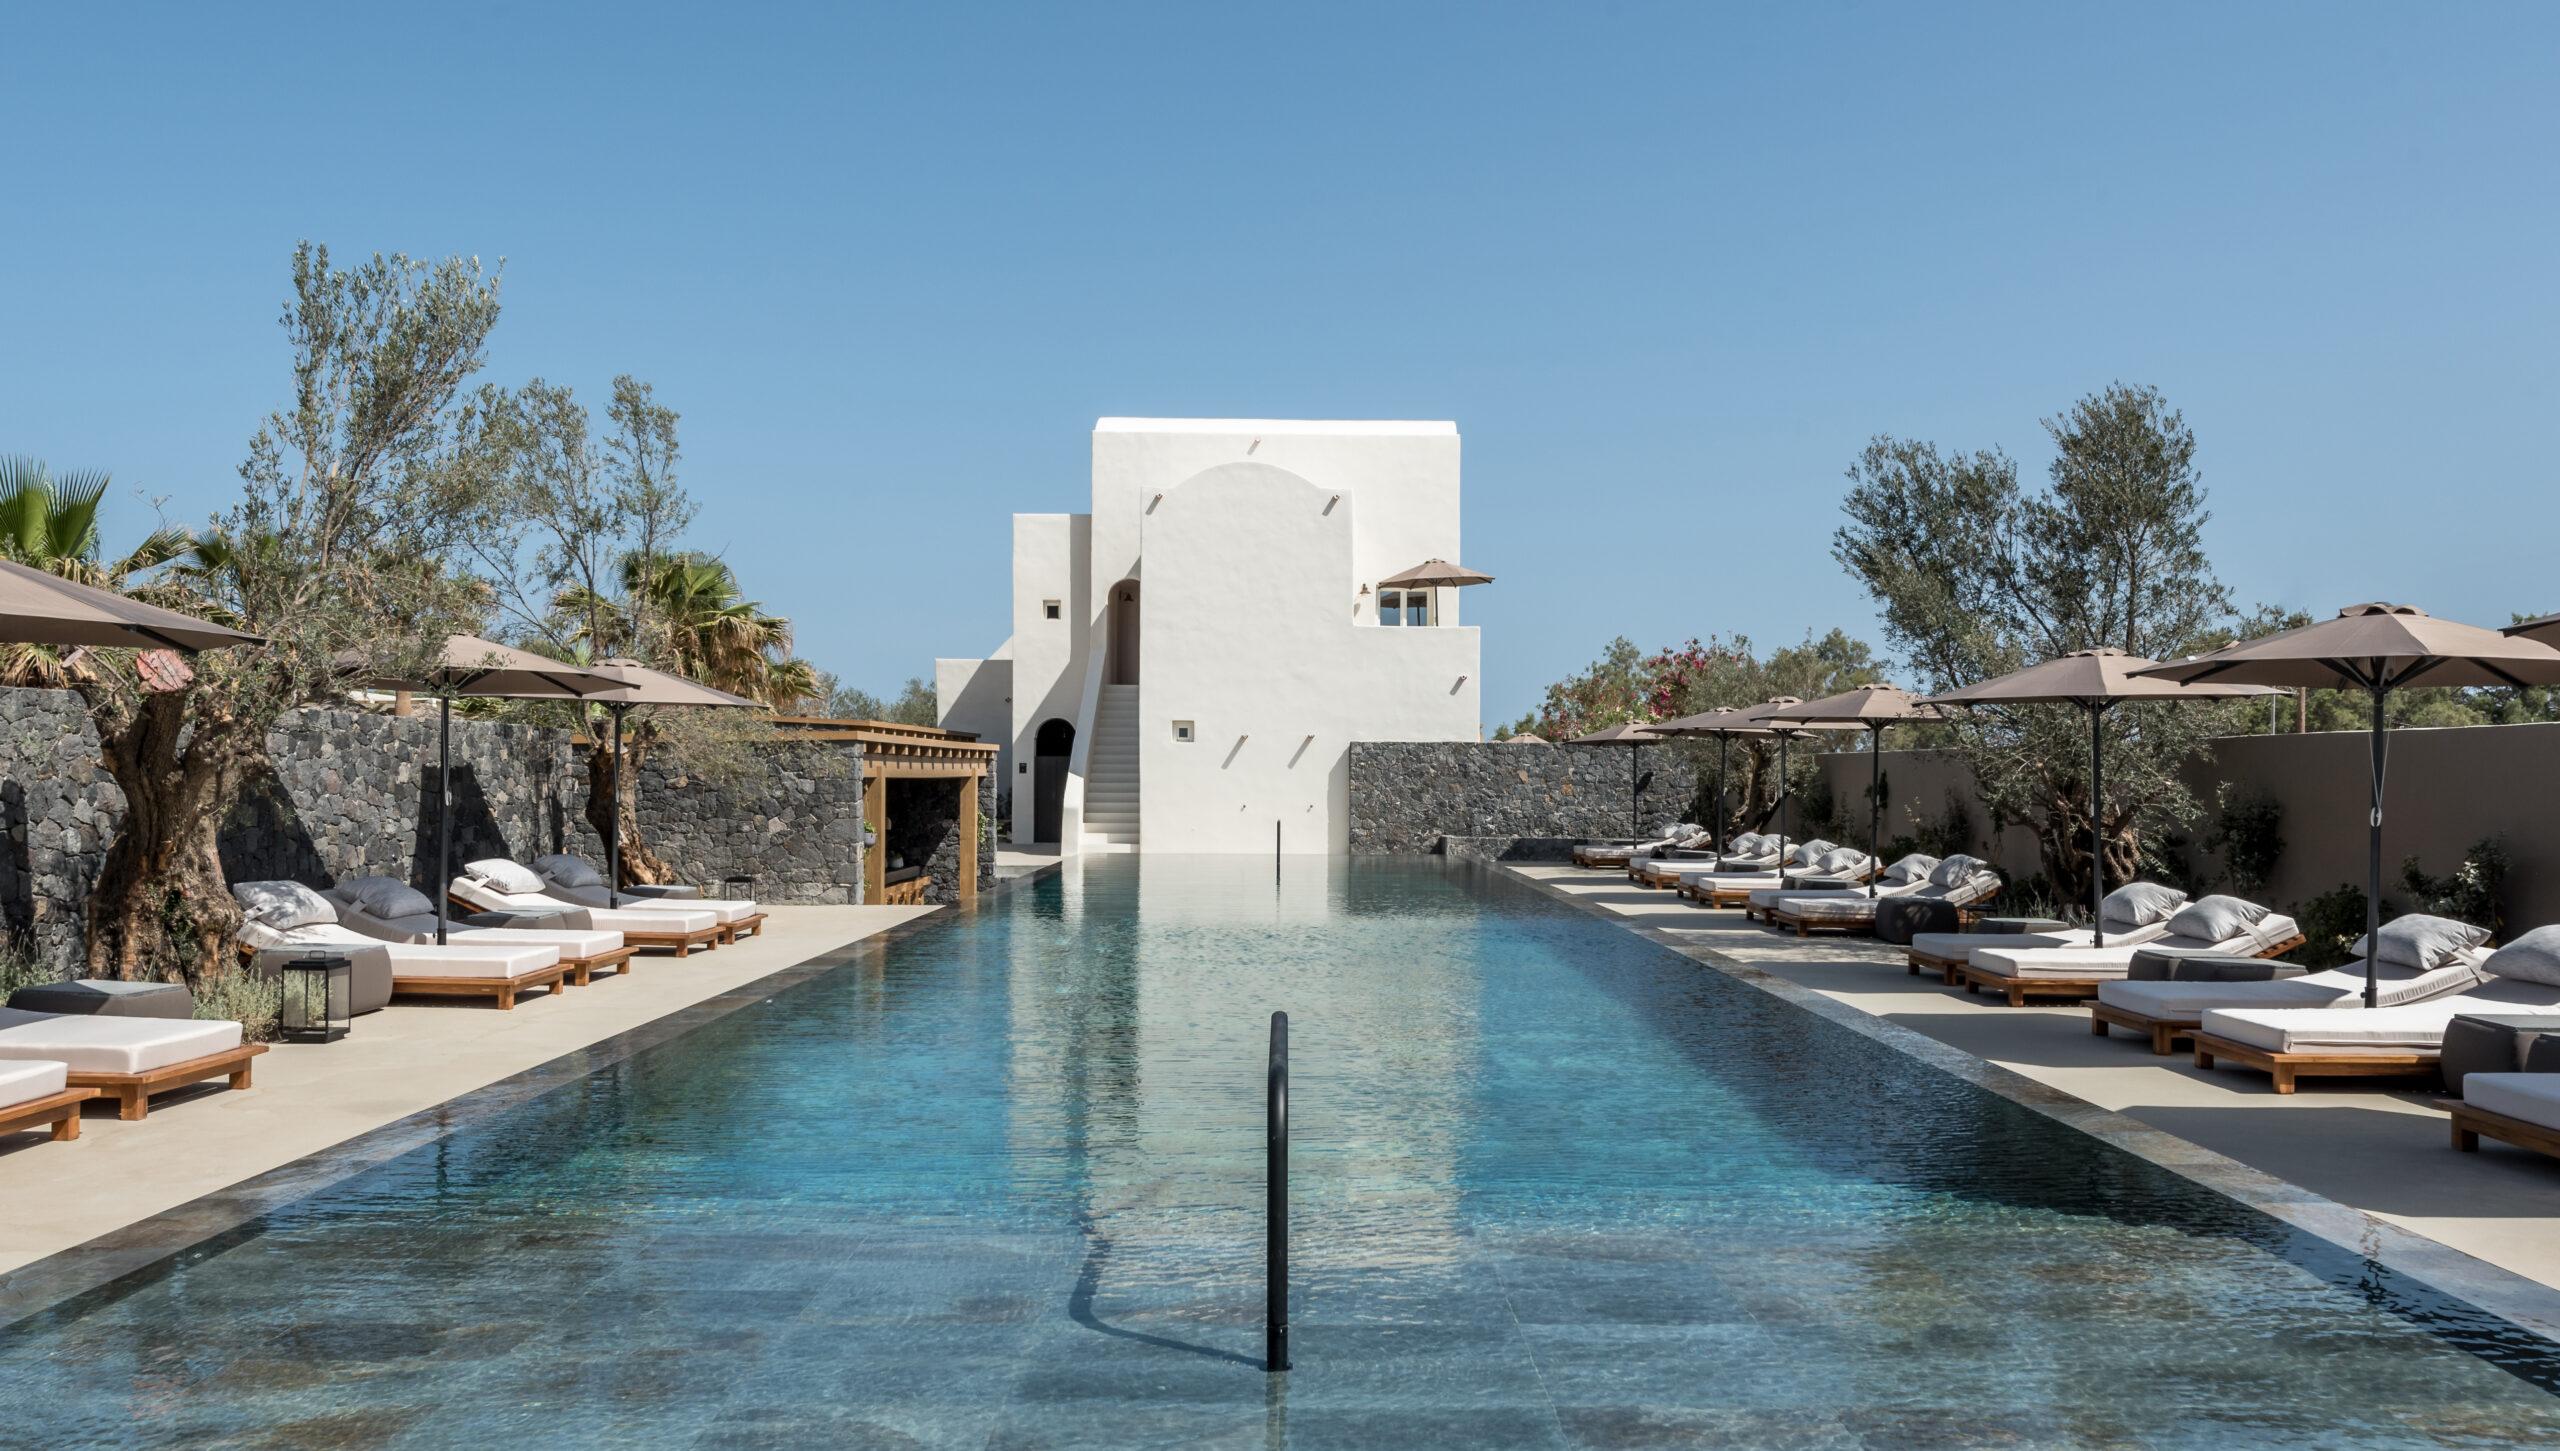 Istoria hotel outdoor swimming pool Santorini Greece luxury hotel villa travel